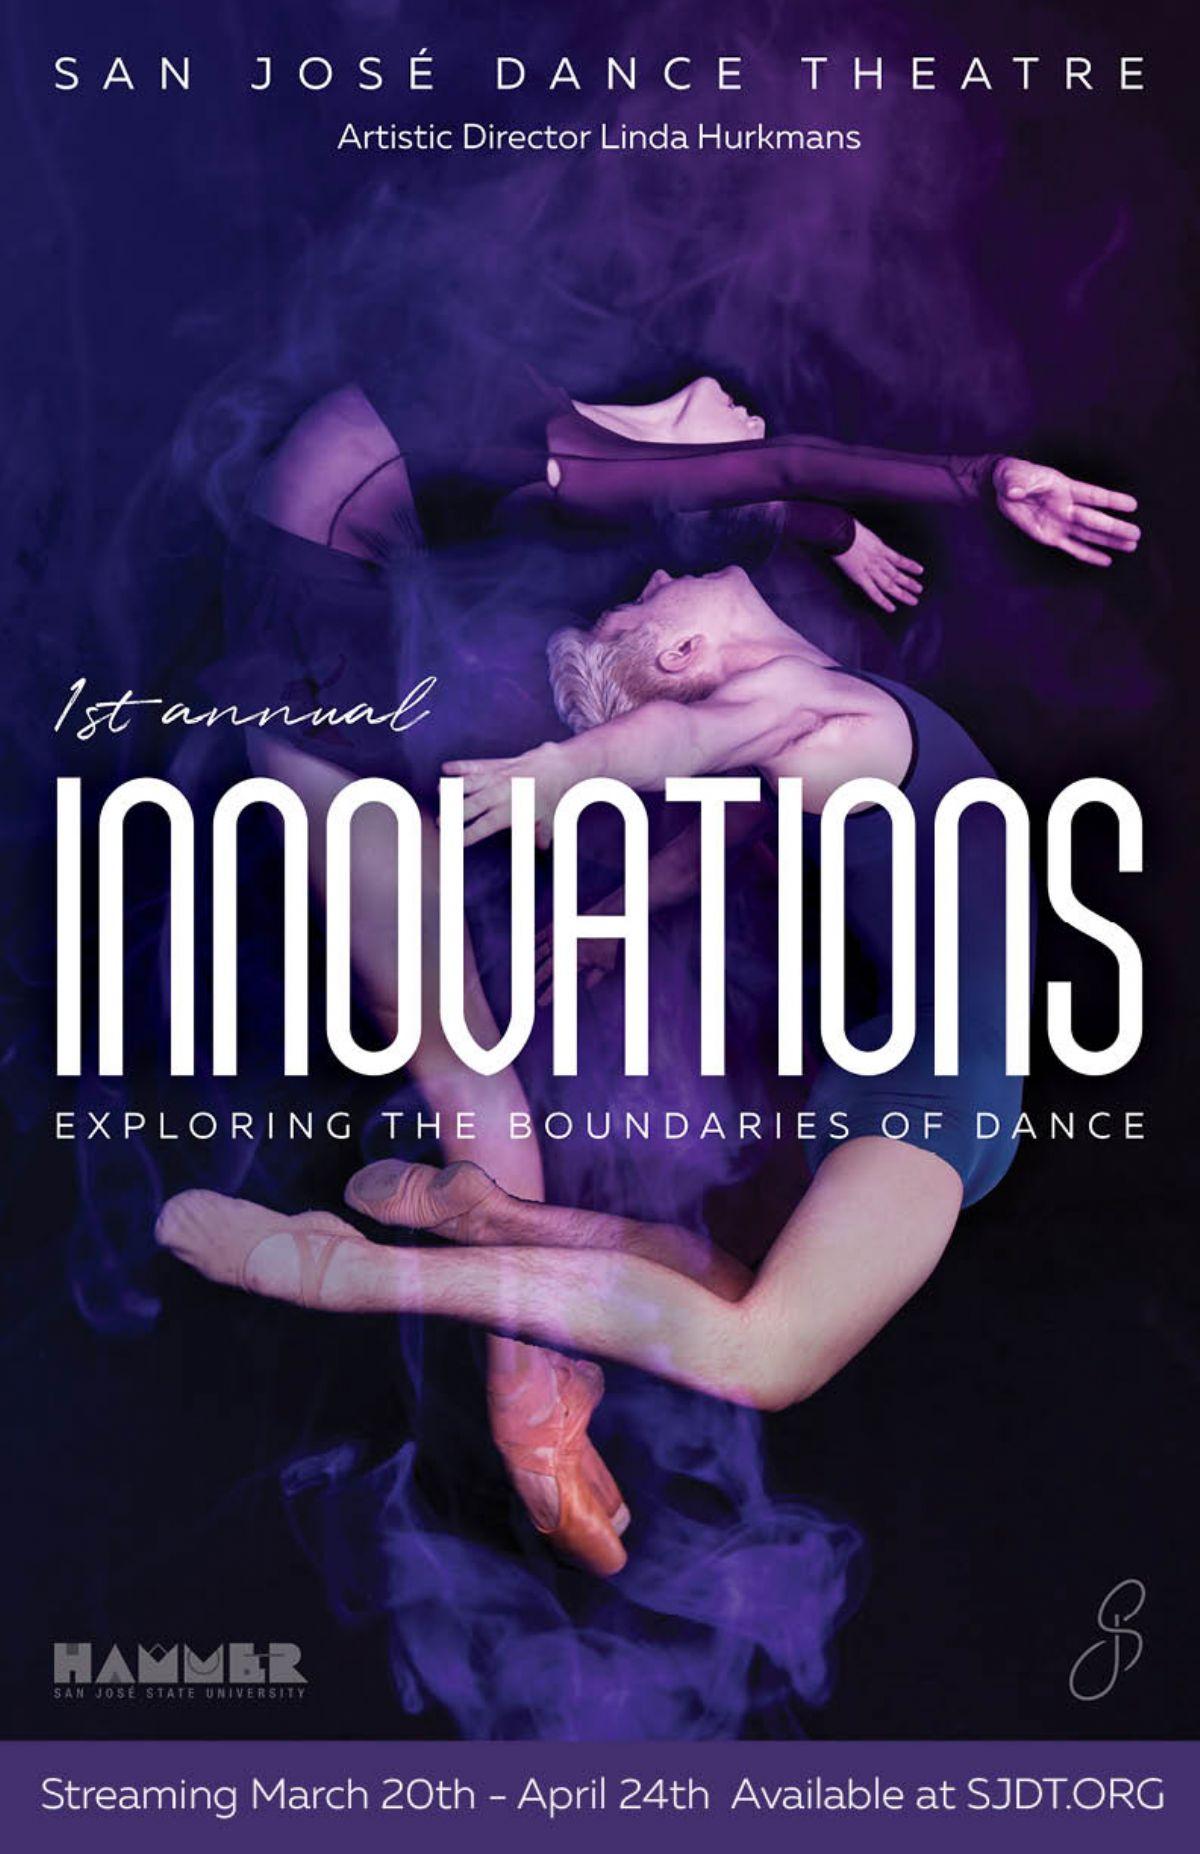 San Jose Dance Theatre Innovations